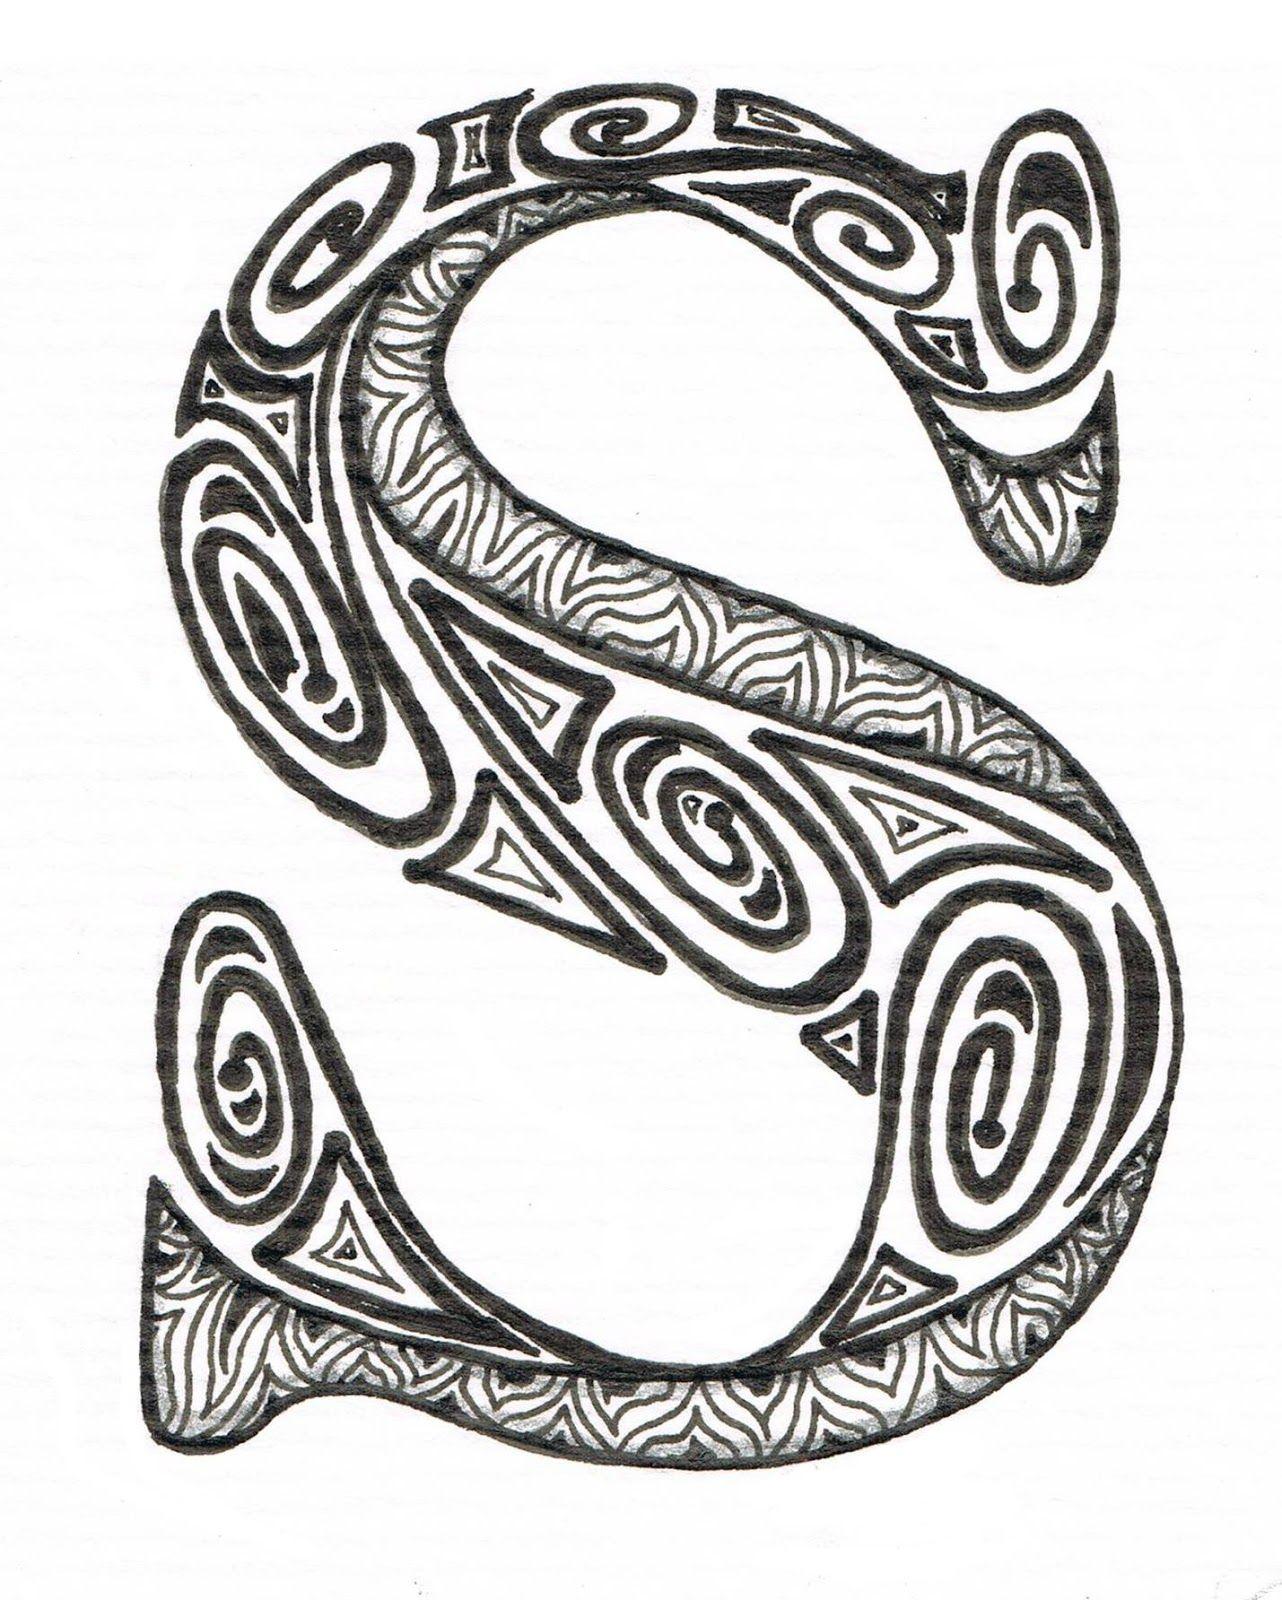 aztec coloring pages letter a - photo#17